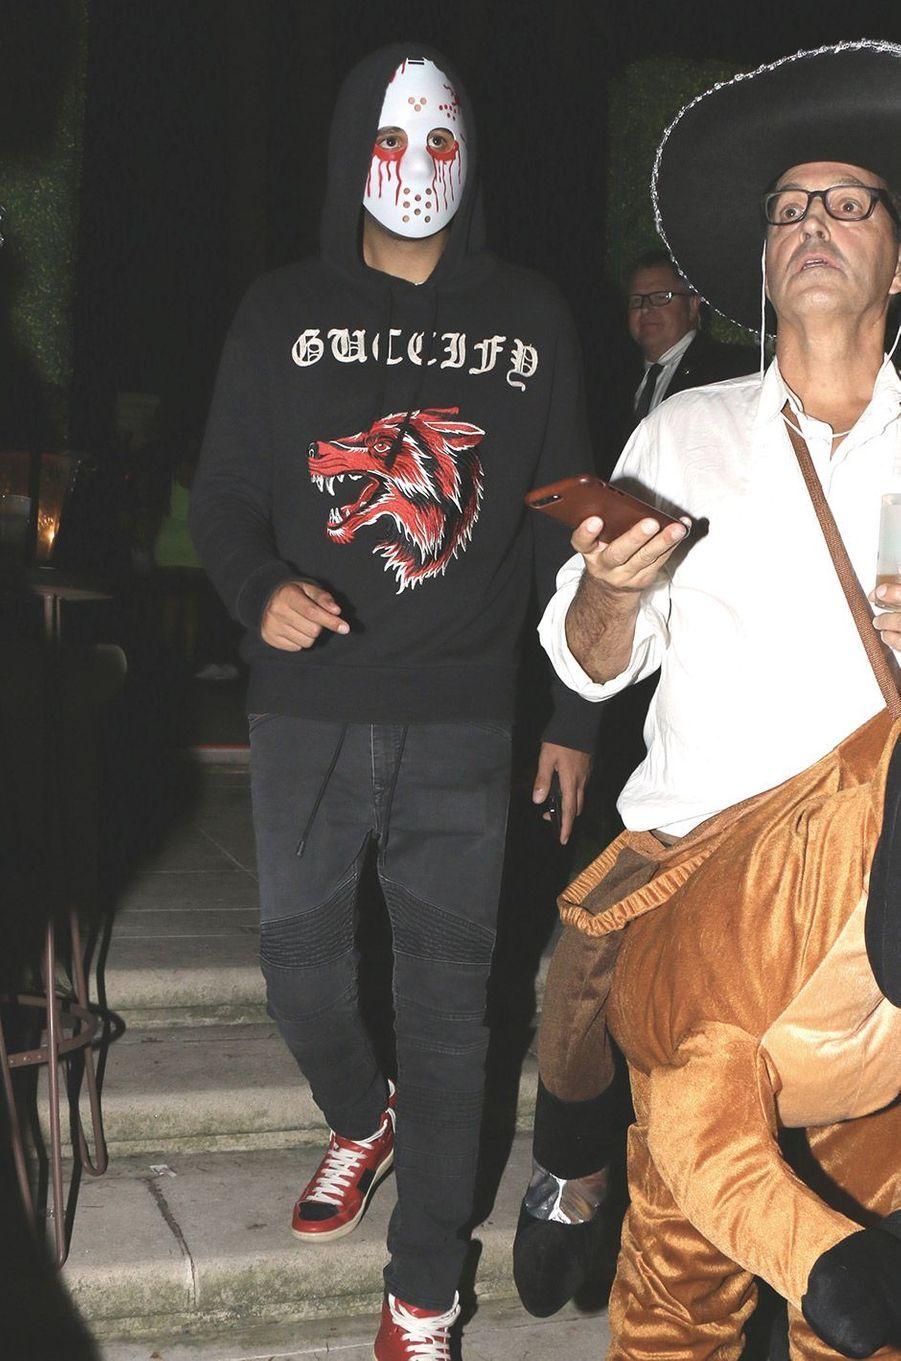 (Peut-être) Léonardo DiCaprio à la soirée Casamigos, samedi 26 octobre